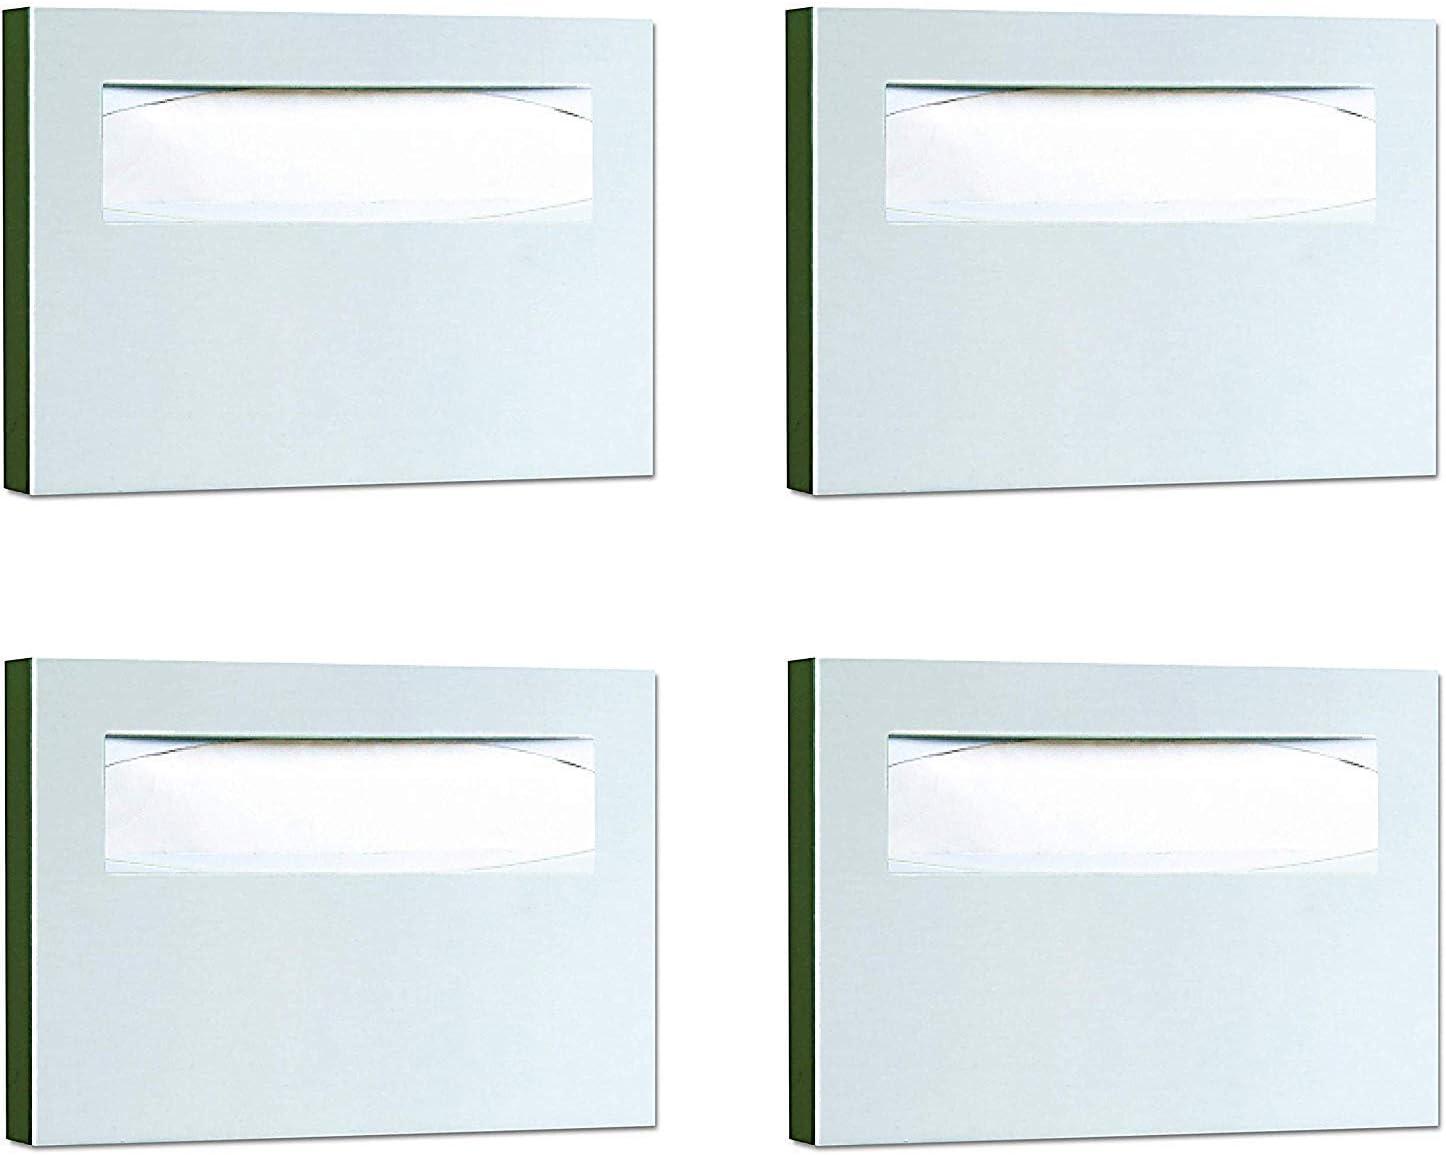 In stock Bobrick 221 Stainless Steel Toilet Seat 4 Dispenser Popular brand in the world Cover 3 15